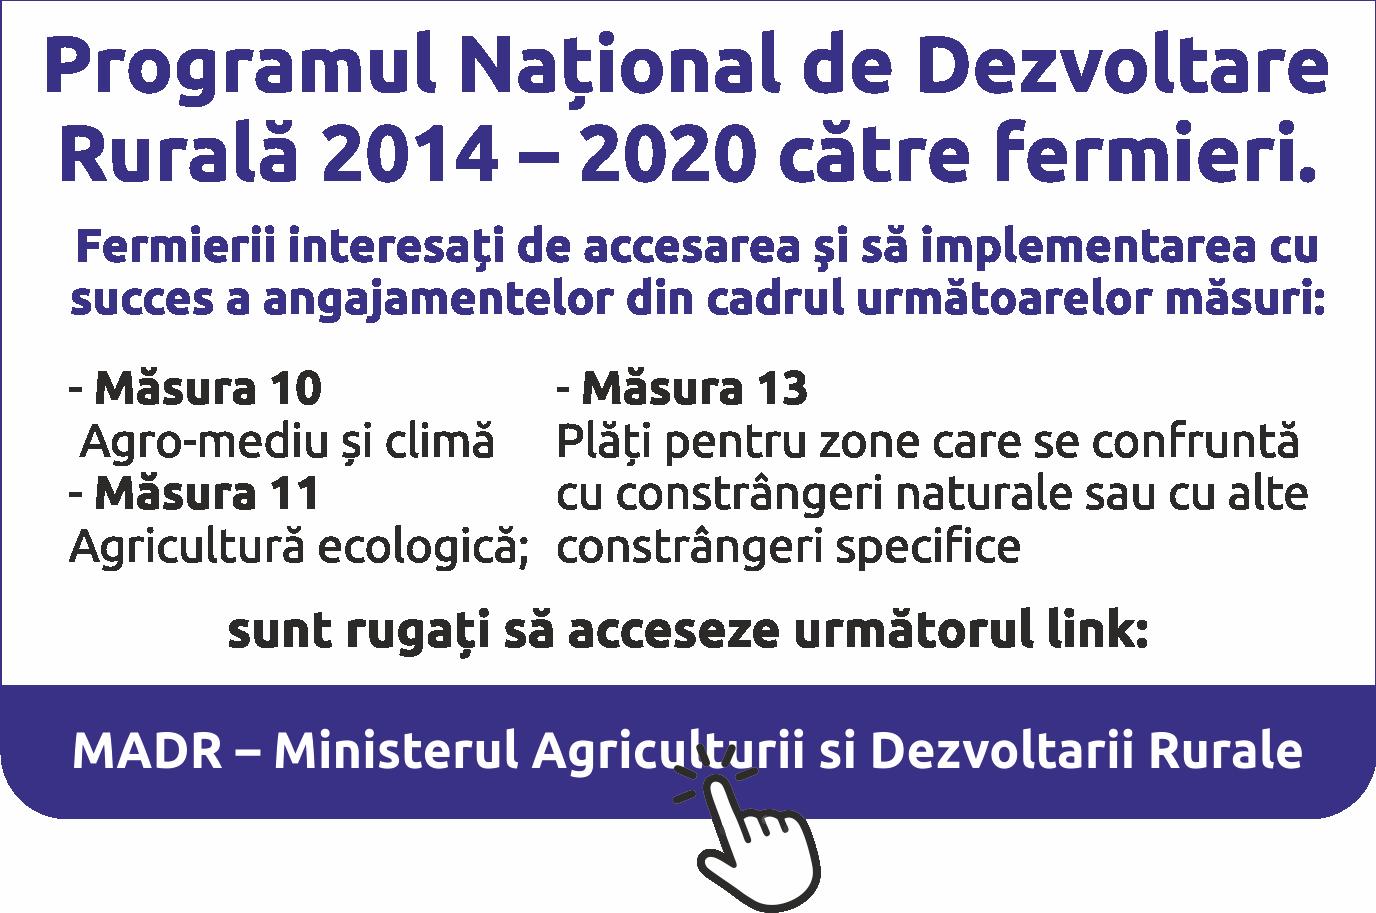 MADR - Ministerul Agriculturii si Dezvoltarii Rurale